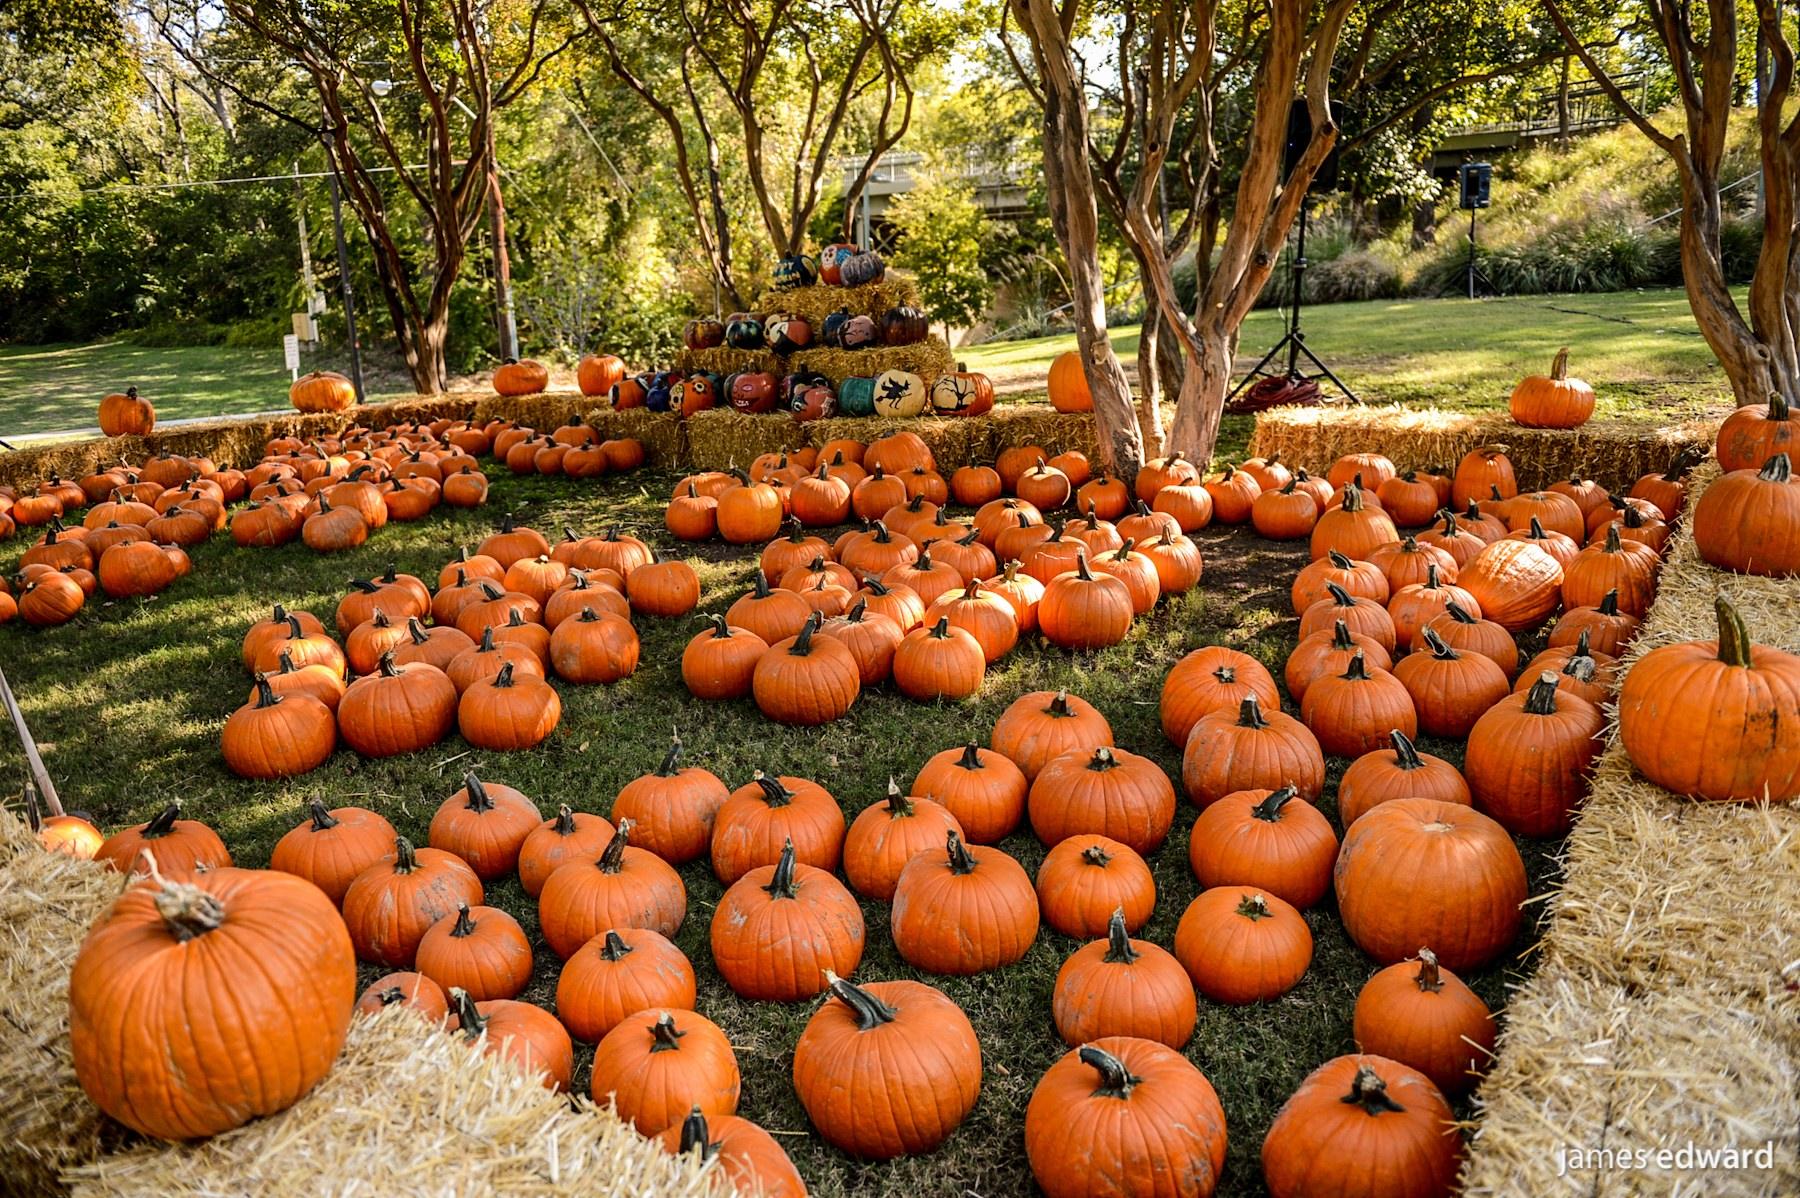 49 fall scene wallpaper with pumpkins on wallpapersafari - Pumpkin wallpaper fall ...